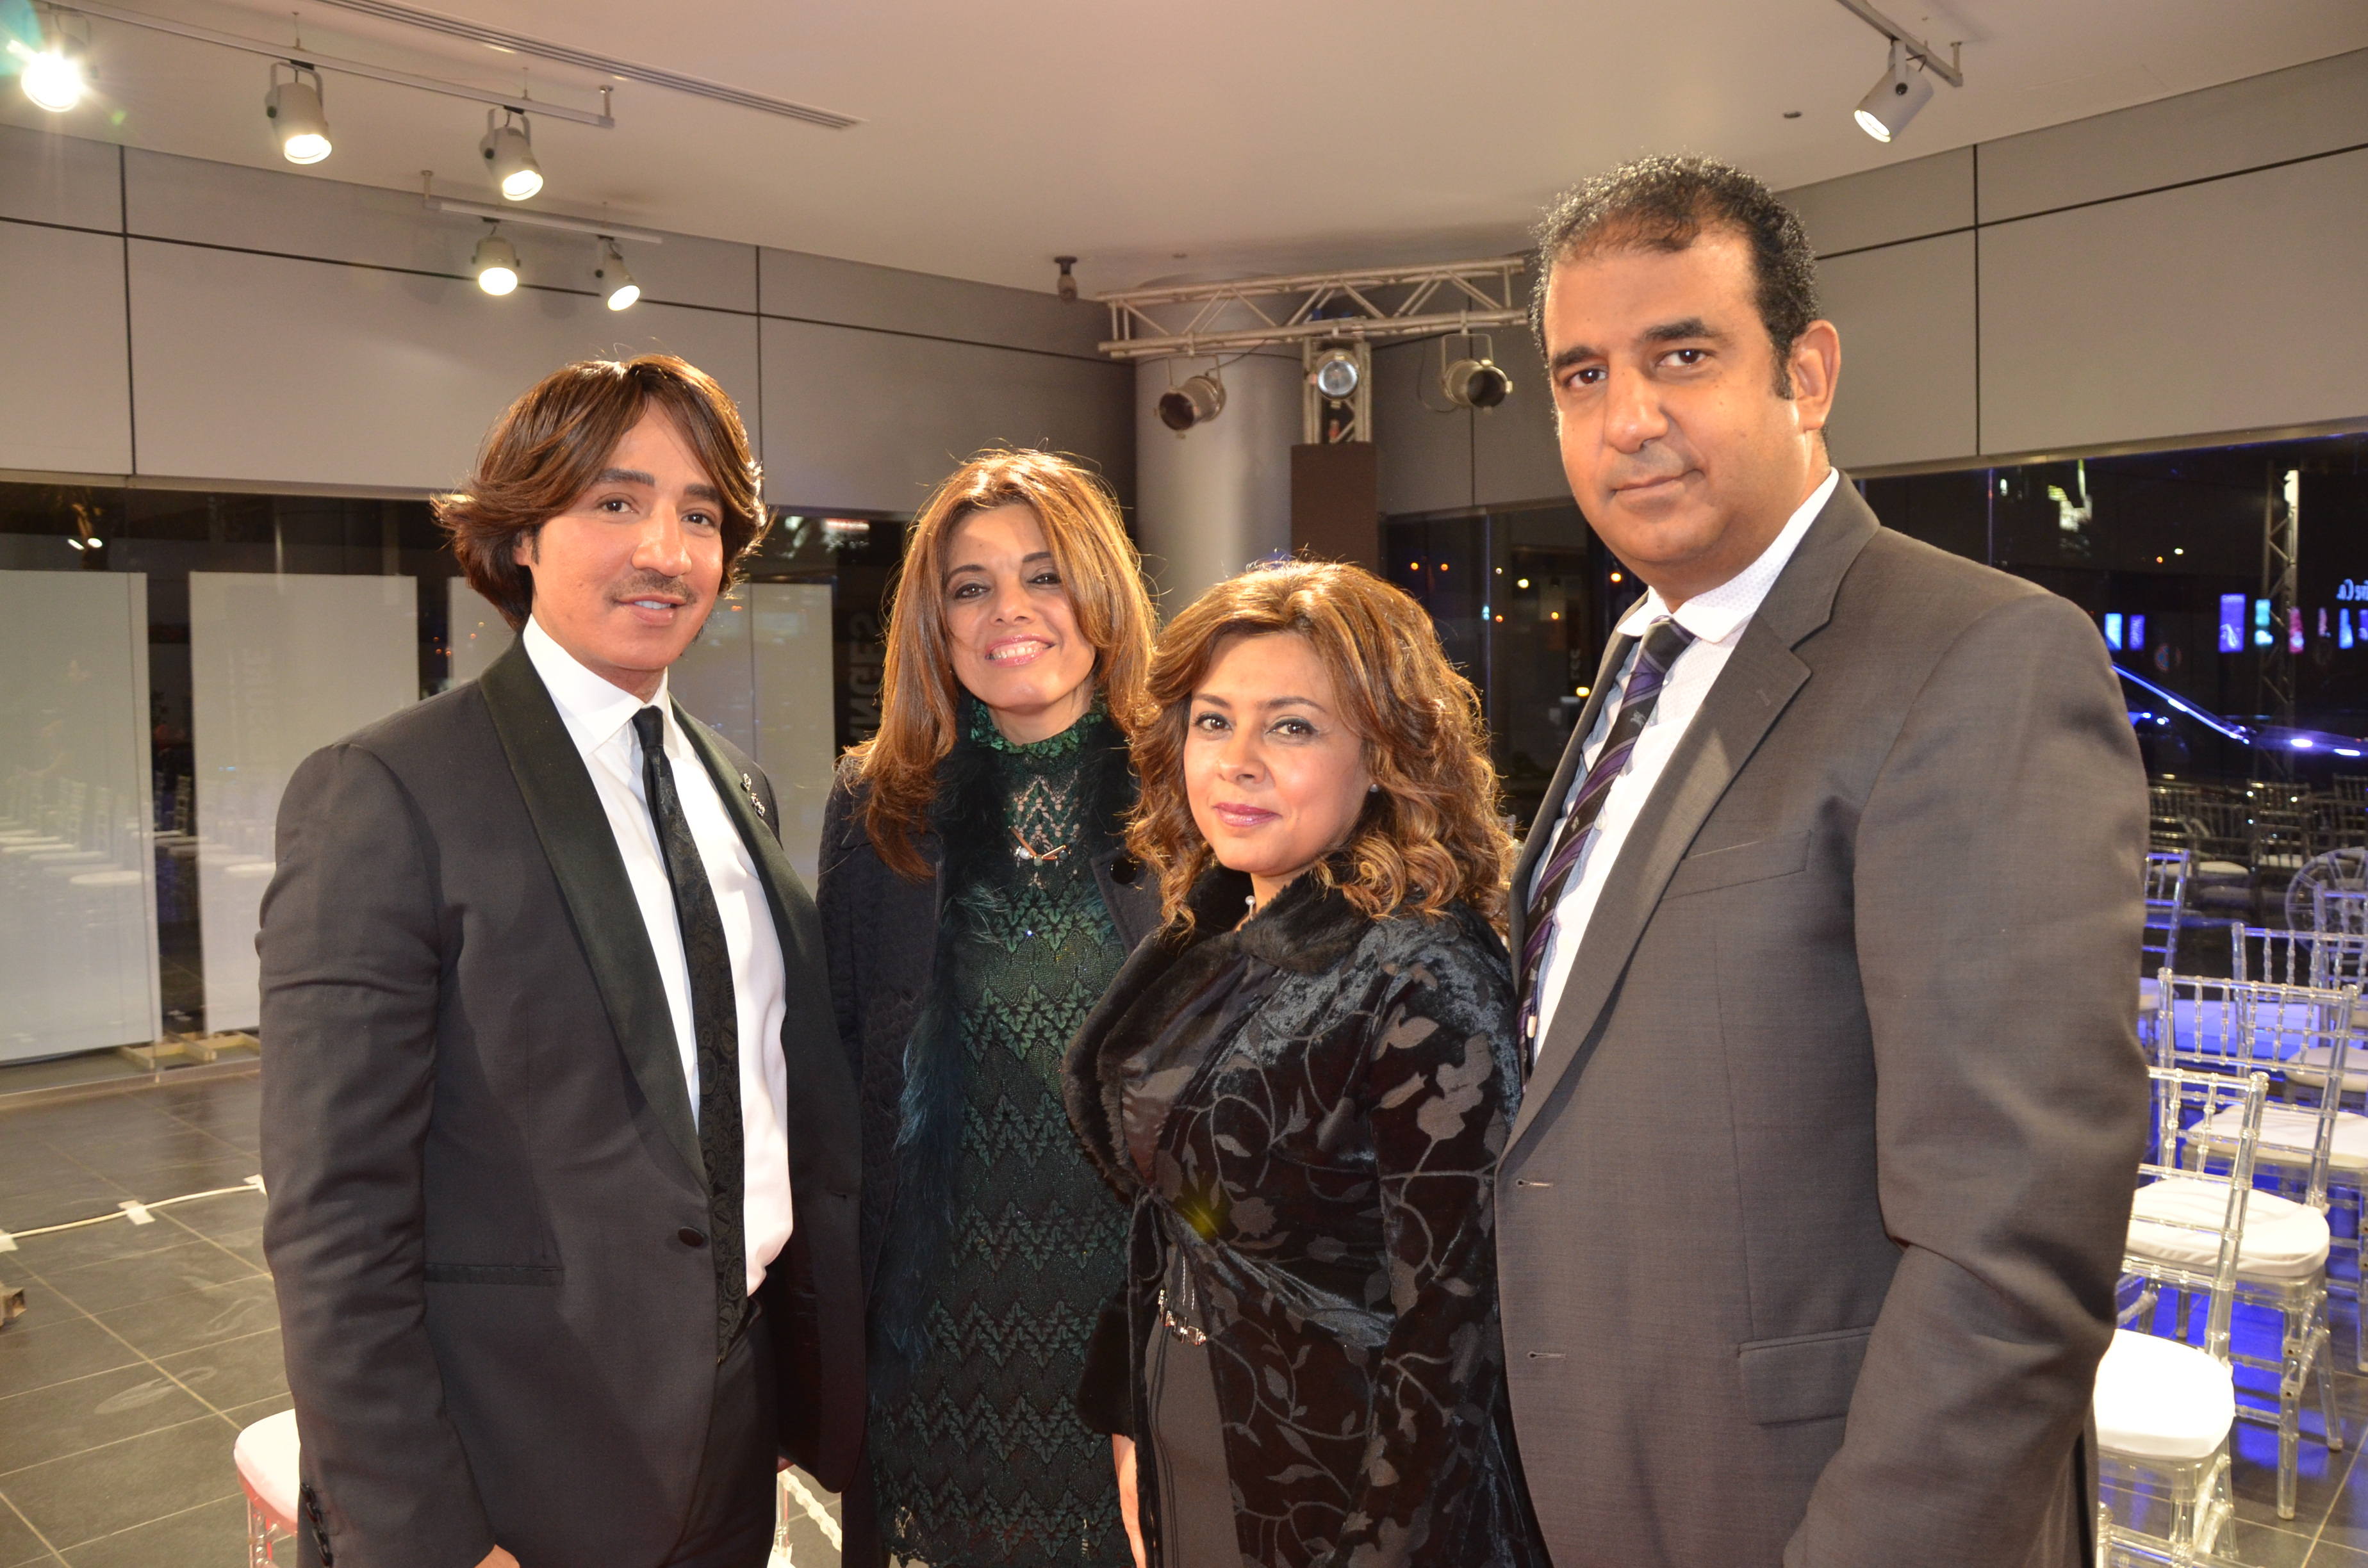 Hany ElBehairy, Ms. Heba Kamal, Ms. Hala Kamal & Mr. Maged Sherif